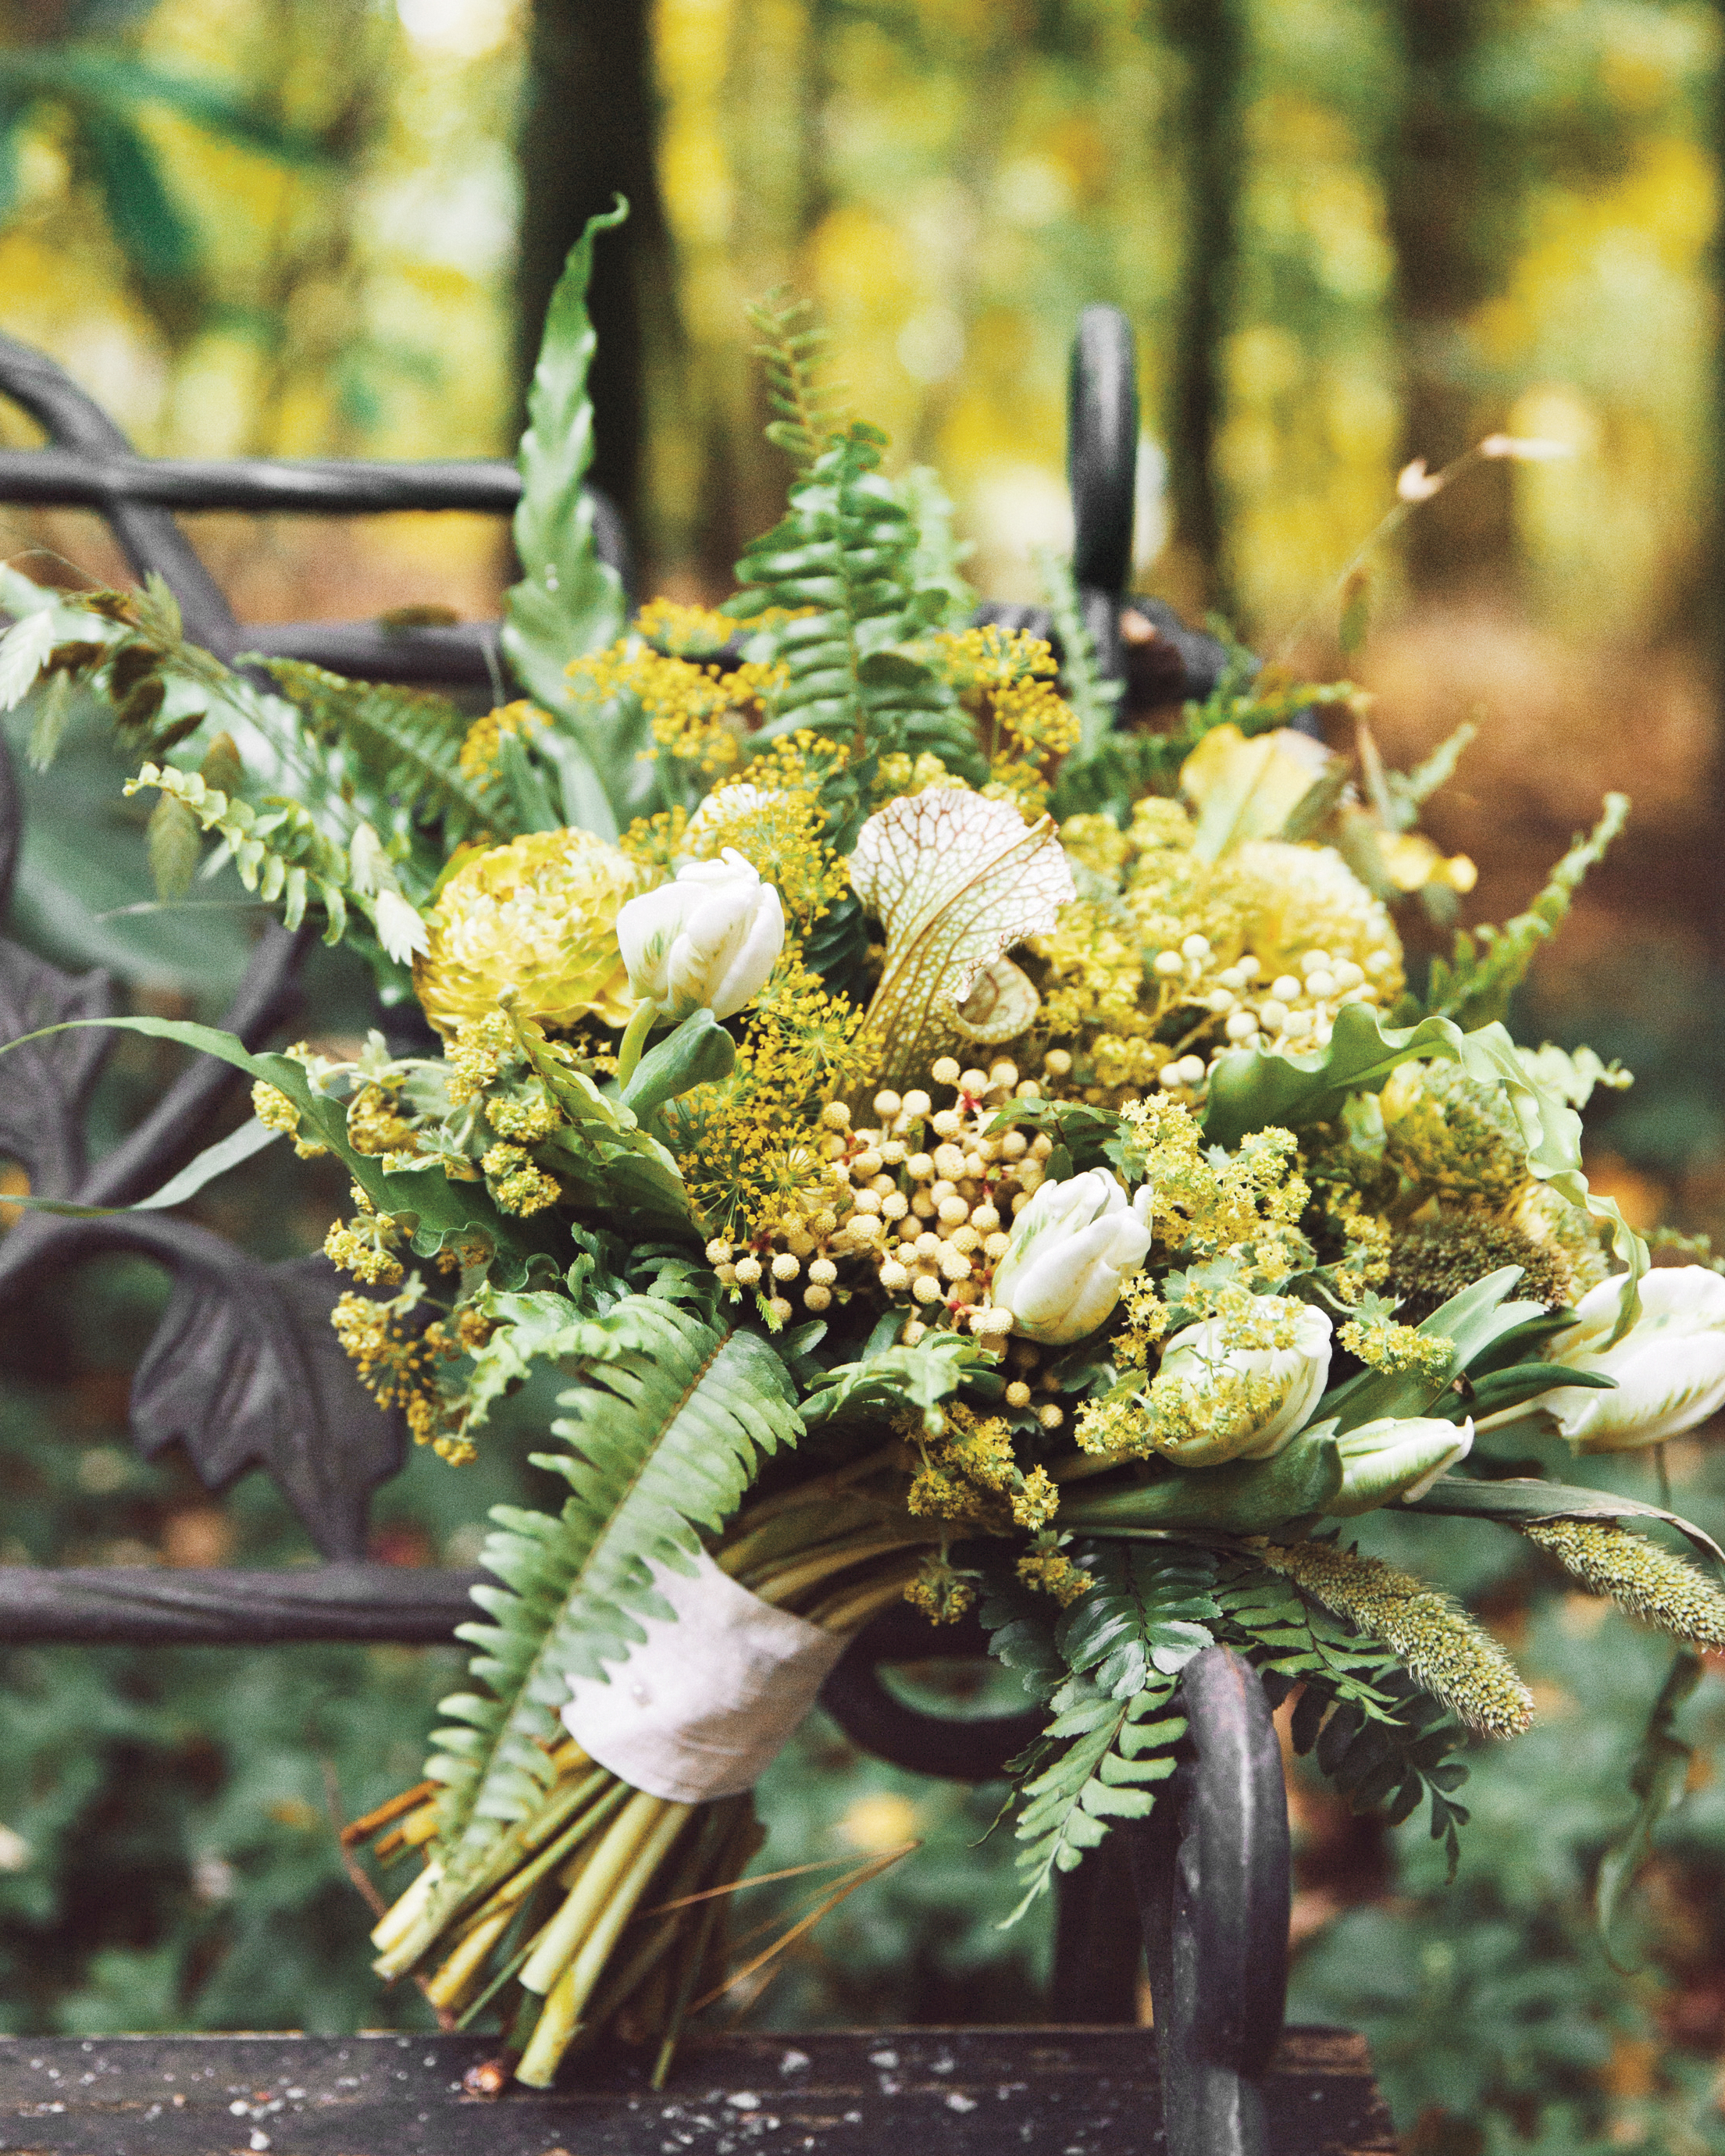 lr-chelsa-dennis-wed-bouquet-041-ds111142.jpg